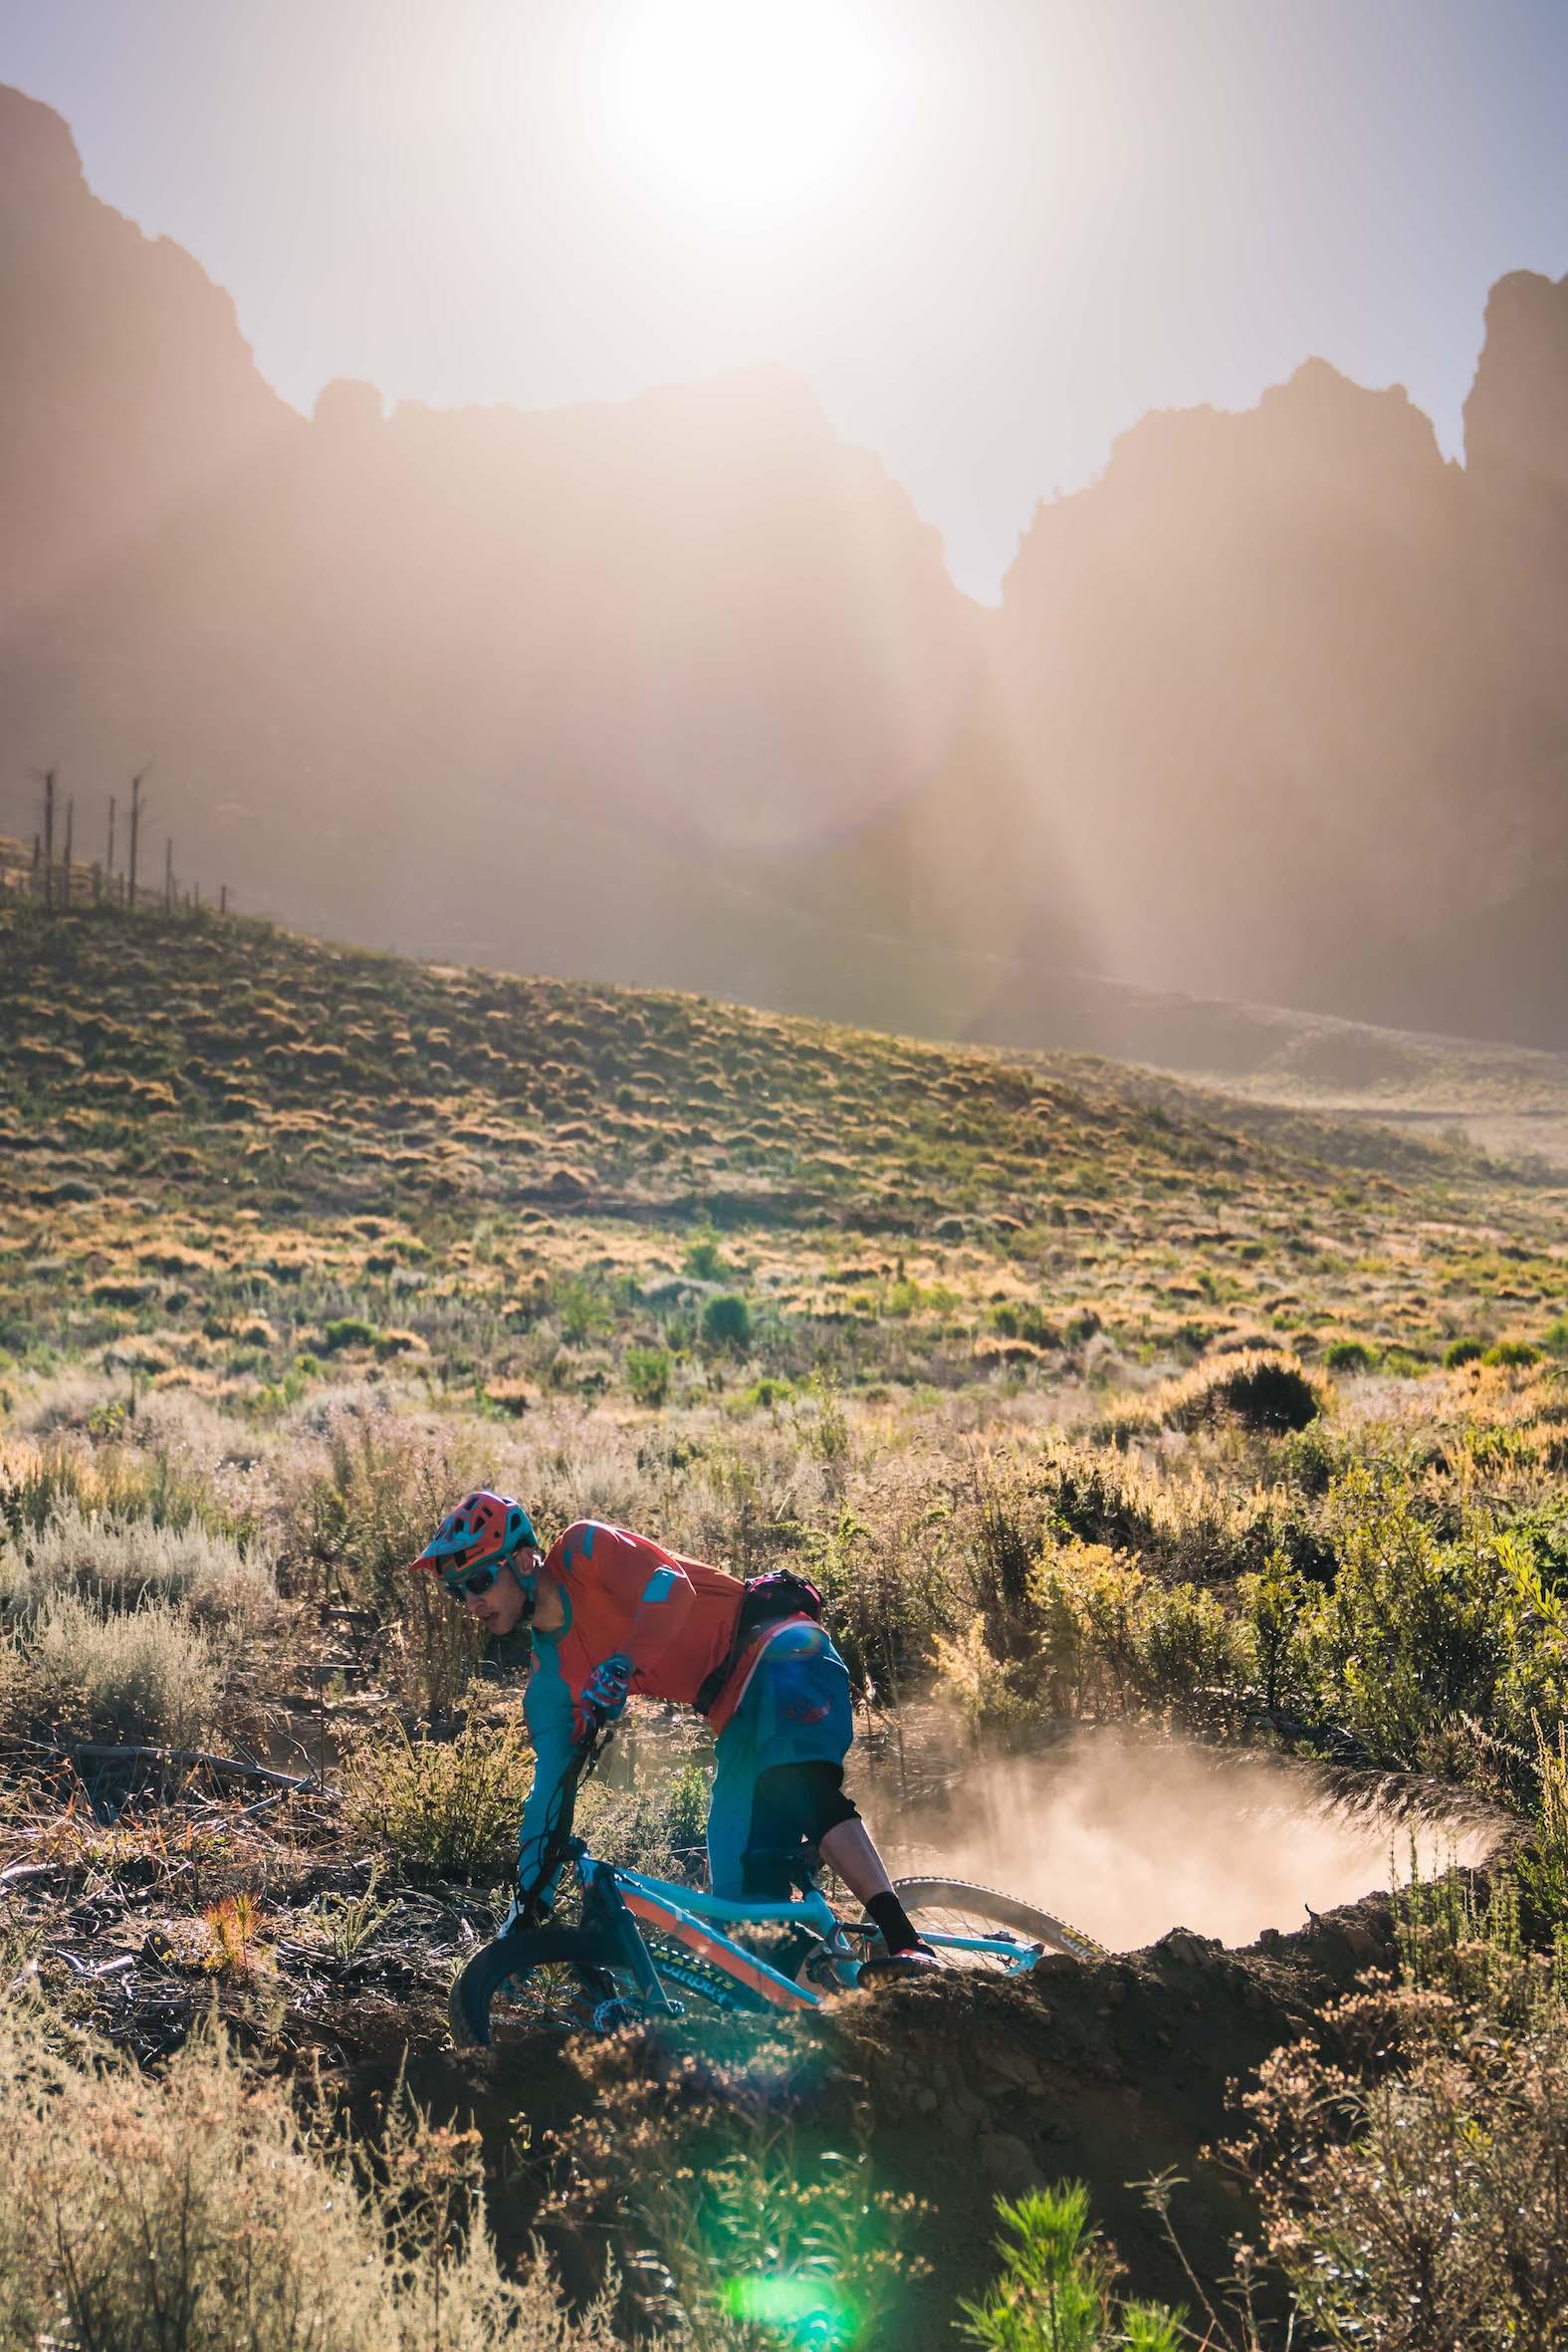 Martin Zietsman riding the new Knolly Fugitive Enduro Mountain Bike